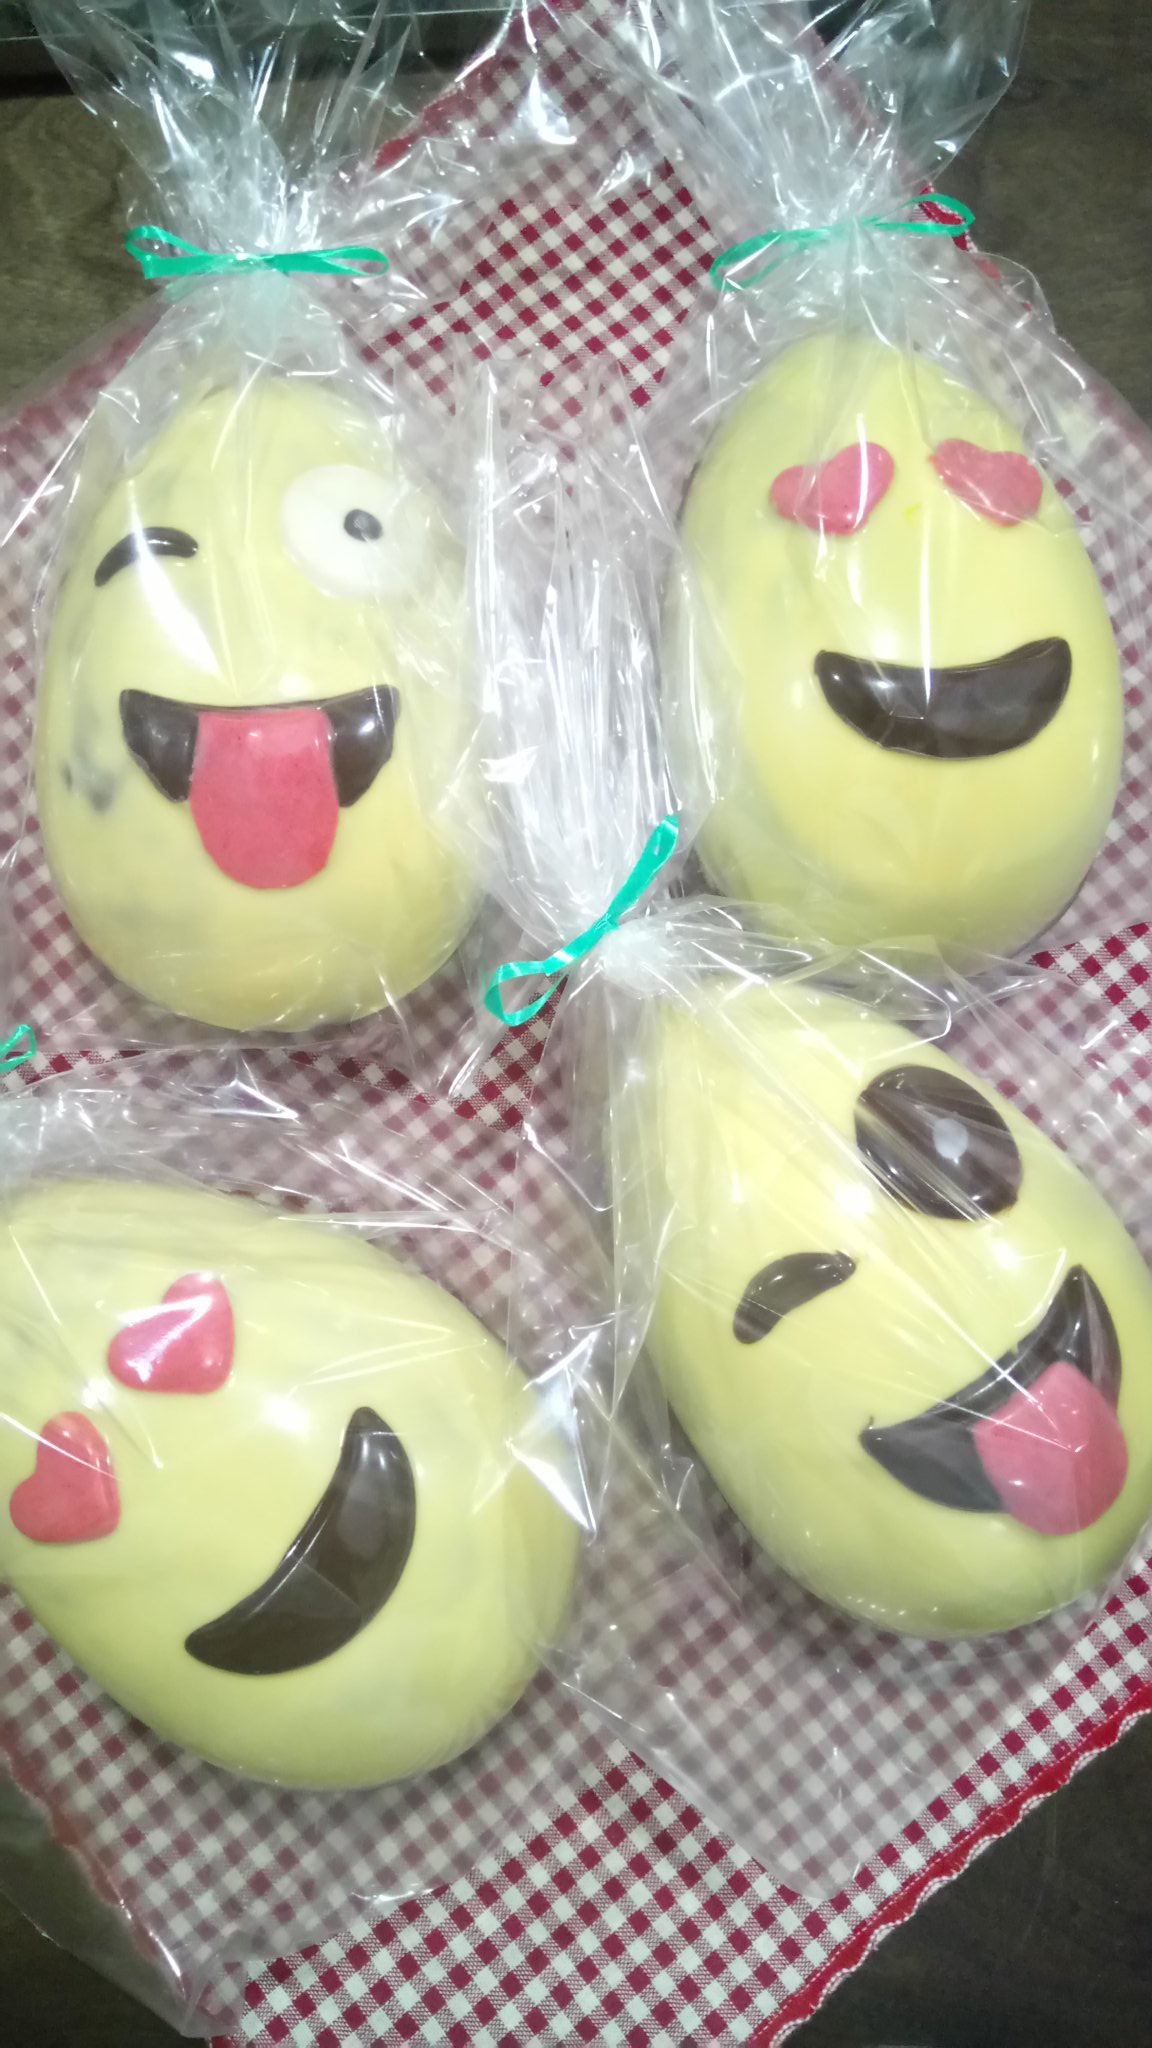 @cocinerosarg #TuHuevoDePascua Emoji divertidos!! 😍😋 https://t.co/hoZrDuIs4k